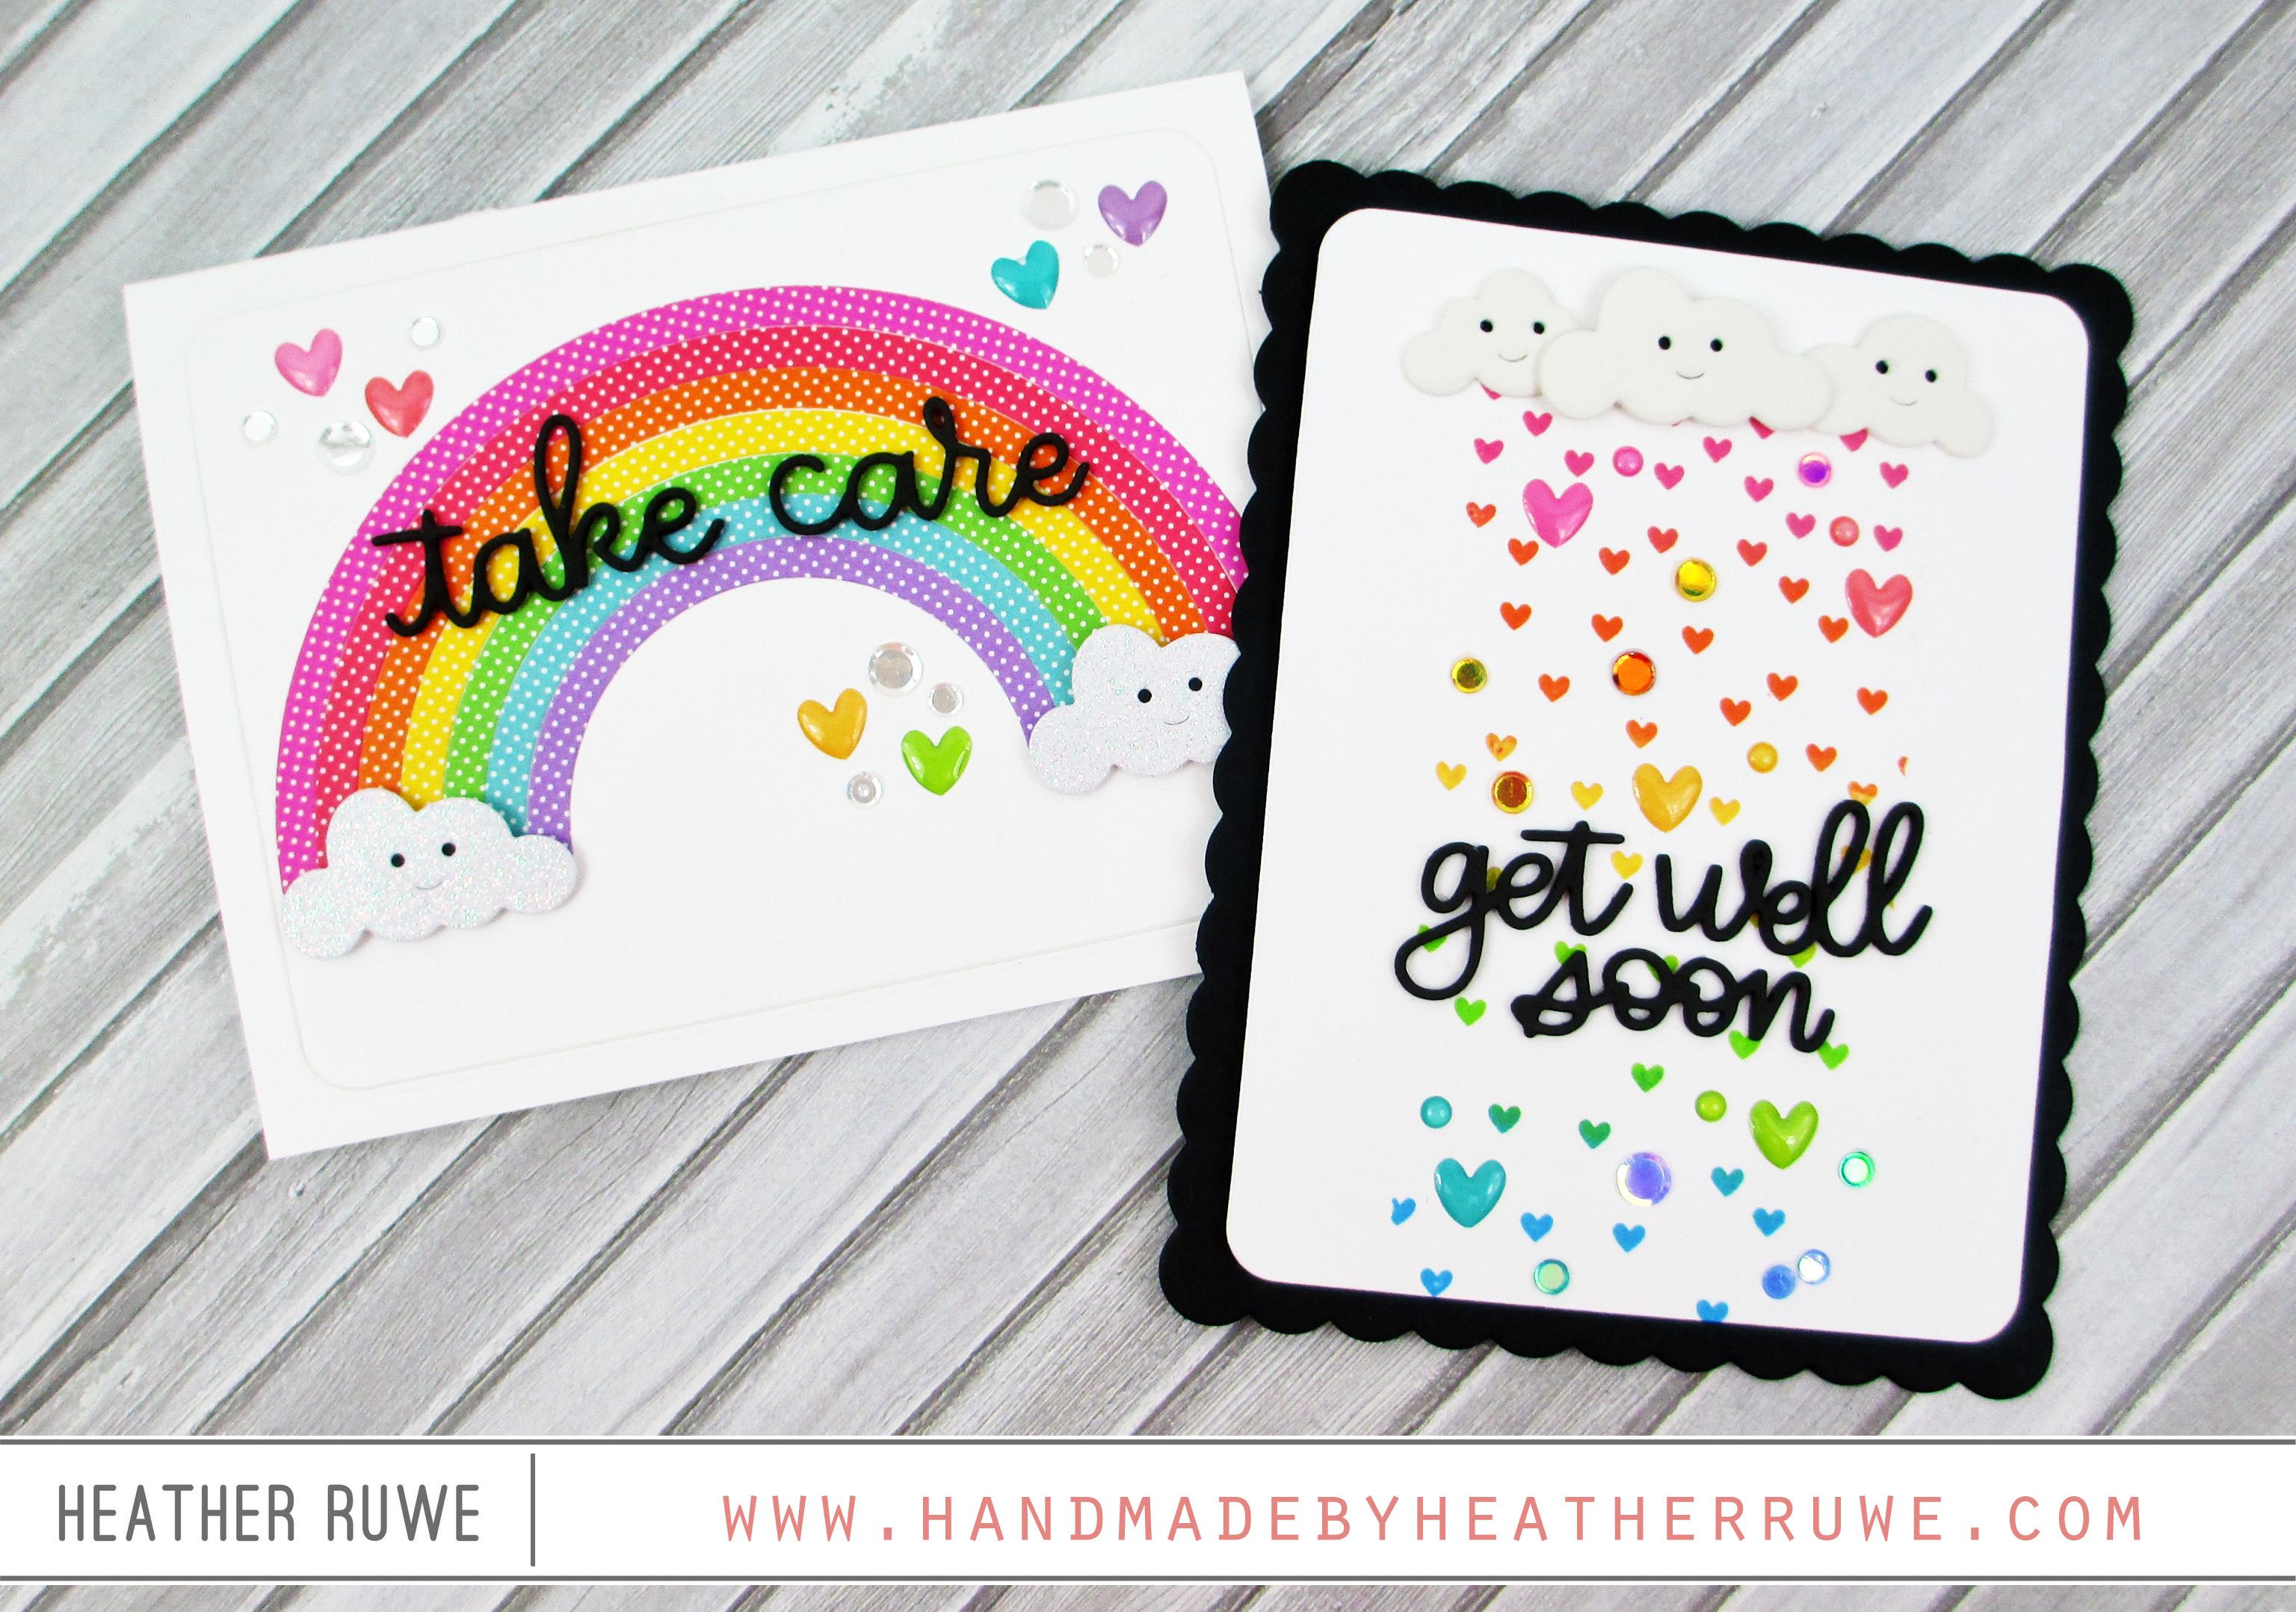 get well soon cards handmade by heather ruwe